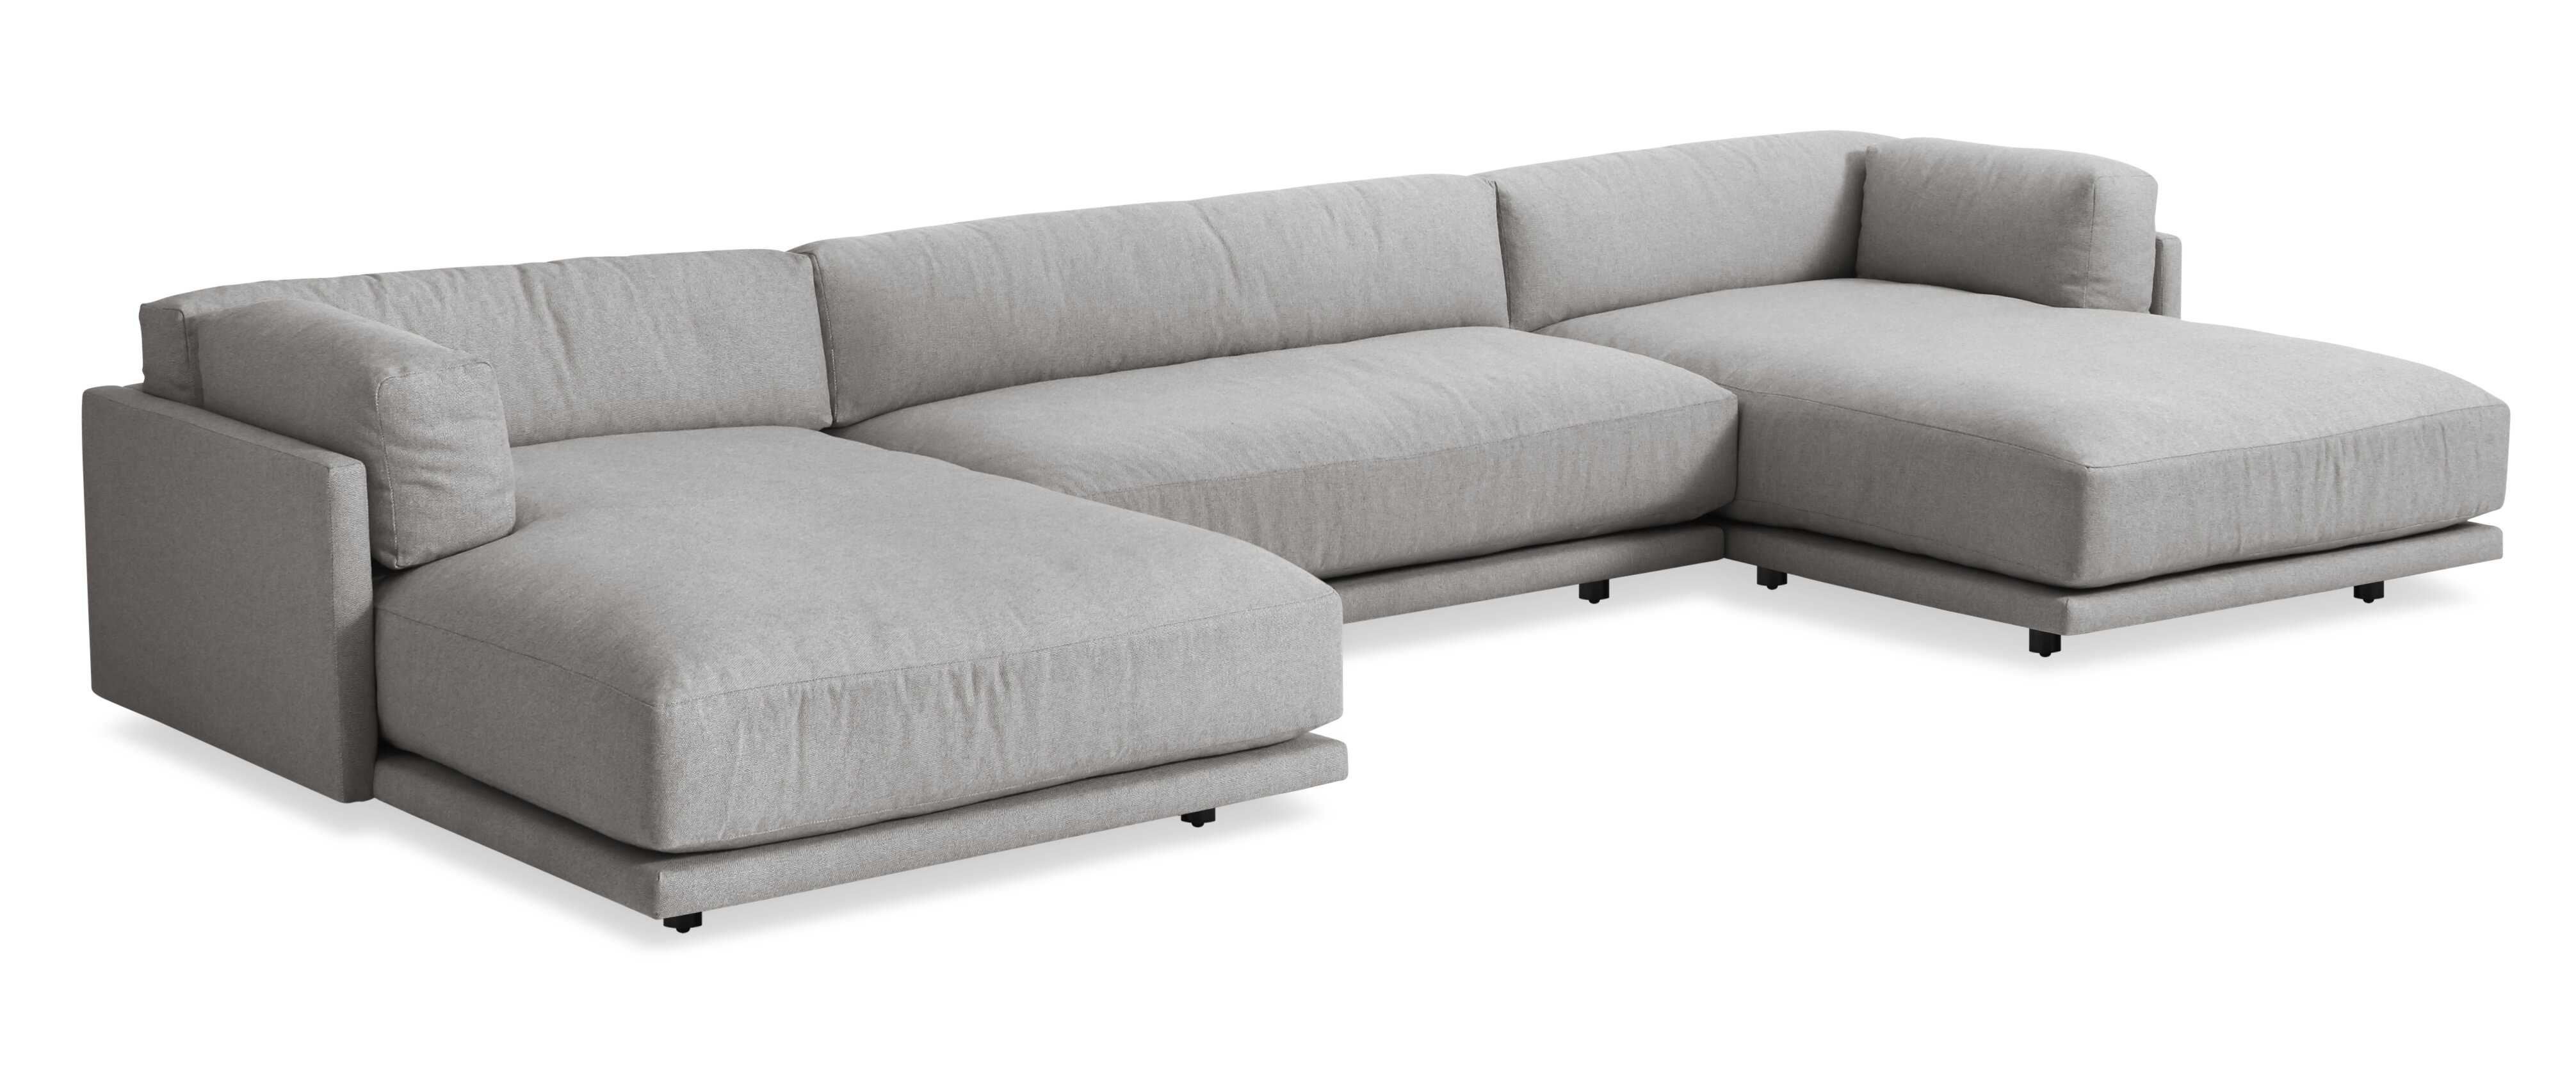 Blu Dot Sunday U-Shaped Sectional Sofa | Wayfair